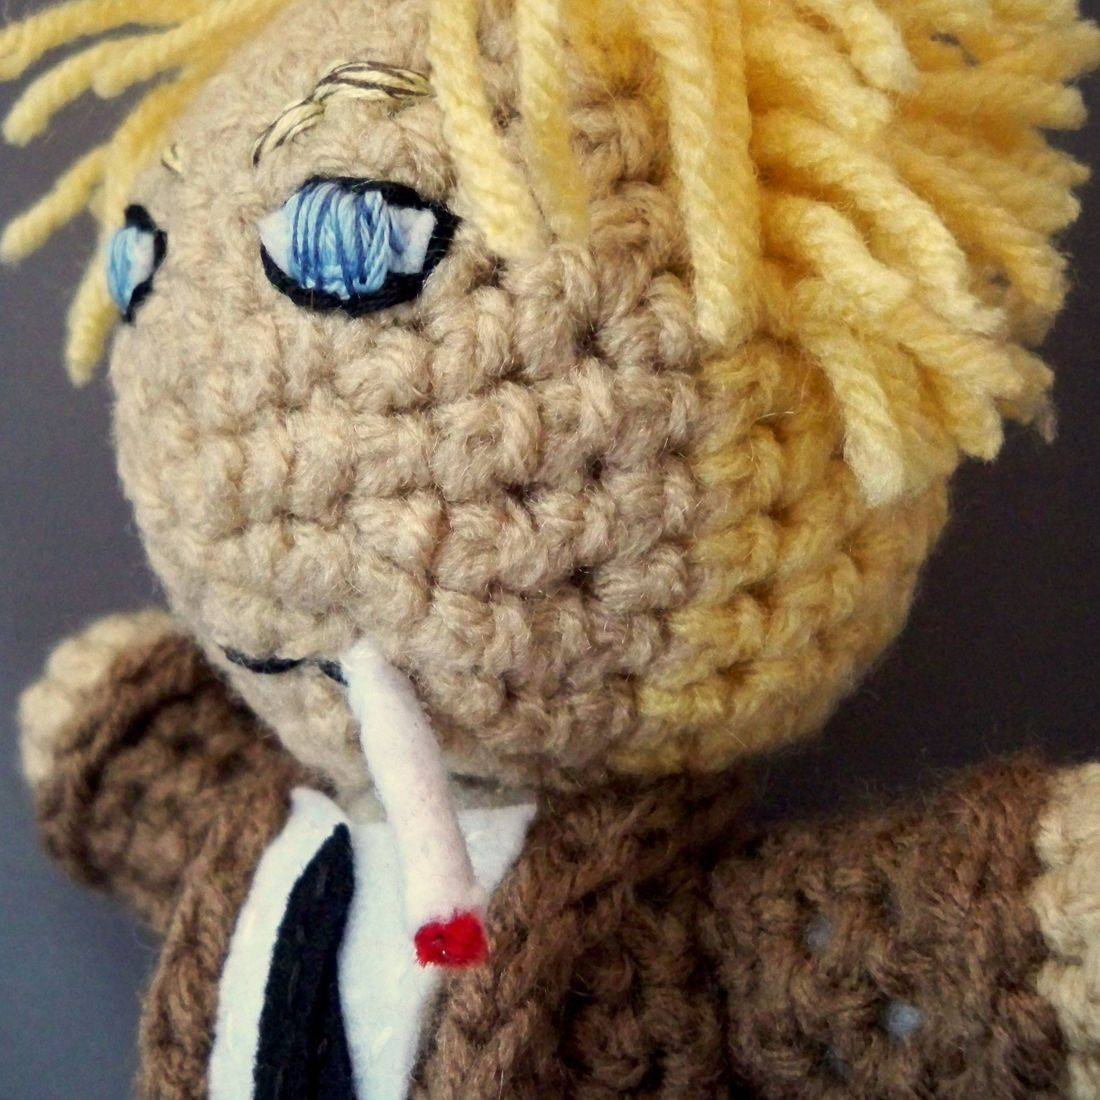 John Constantine, Constantine, amigurumi, crochet, handmade, comicbook, nerd, doll, plush, custom